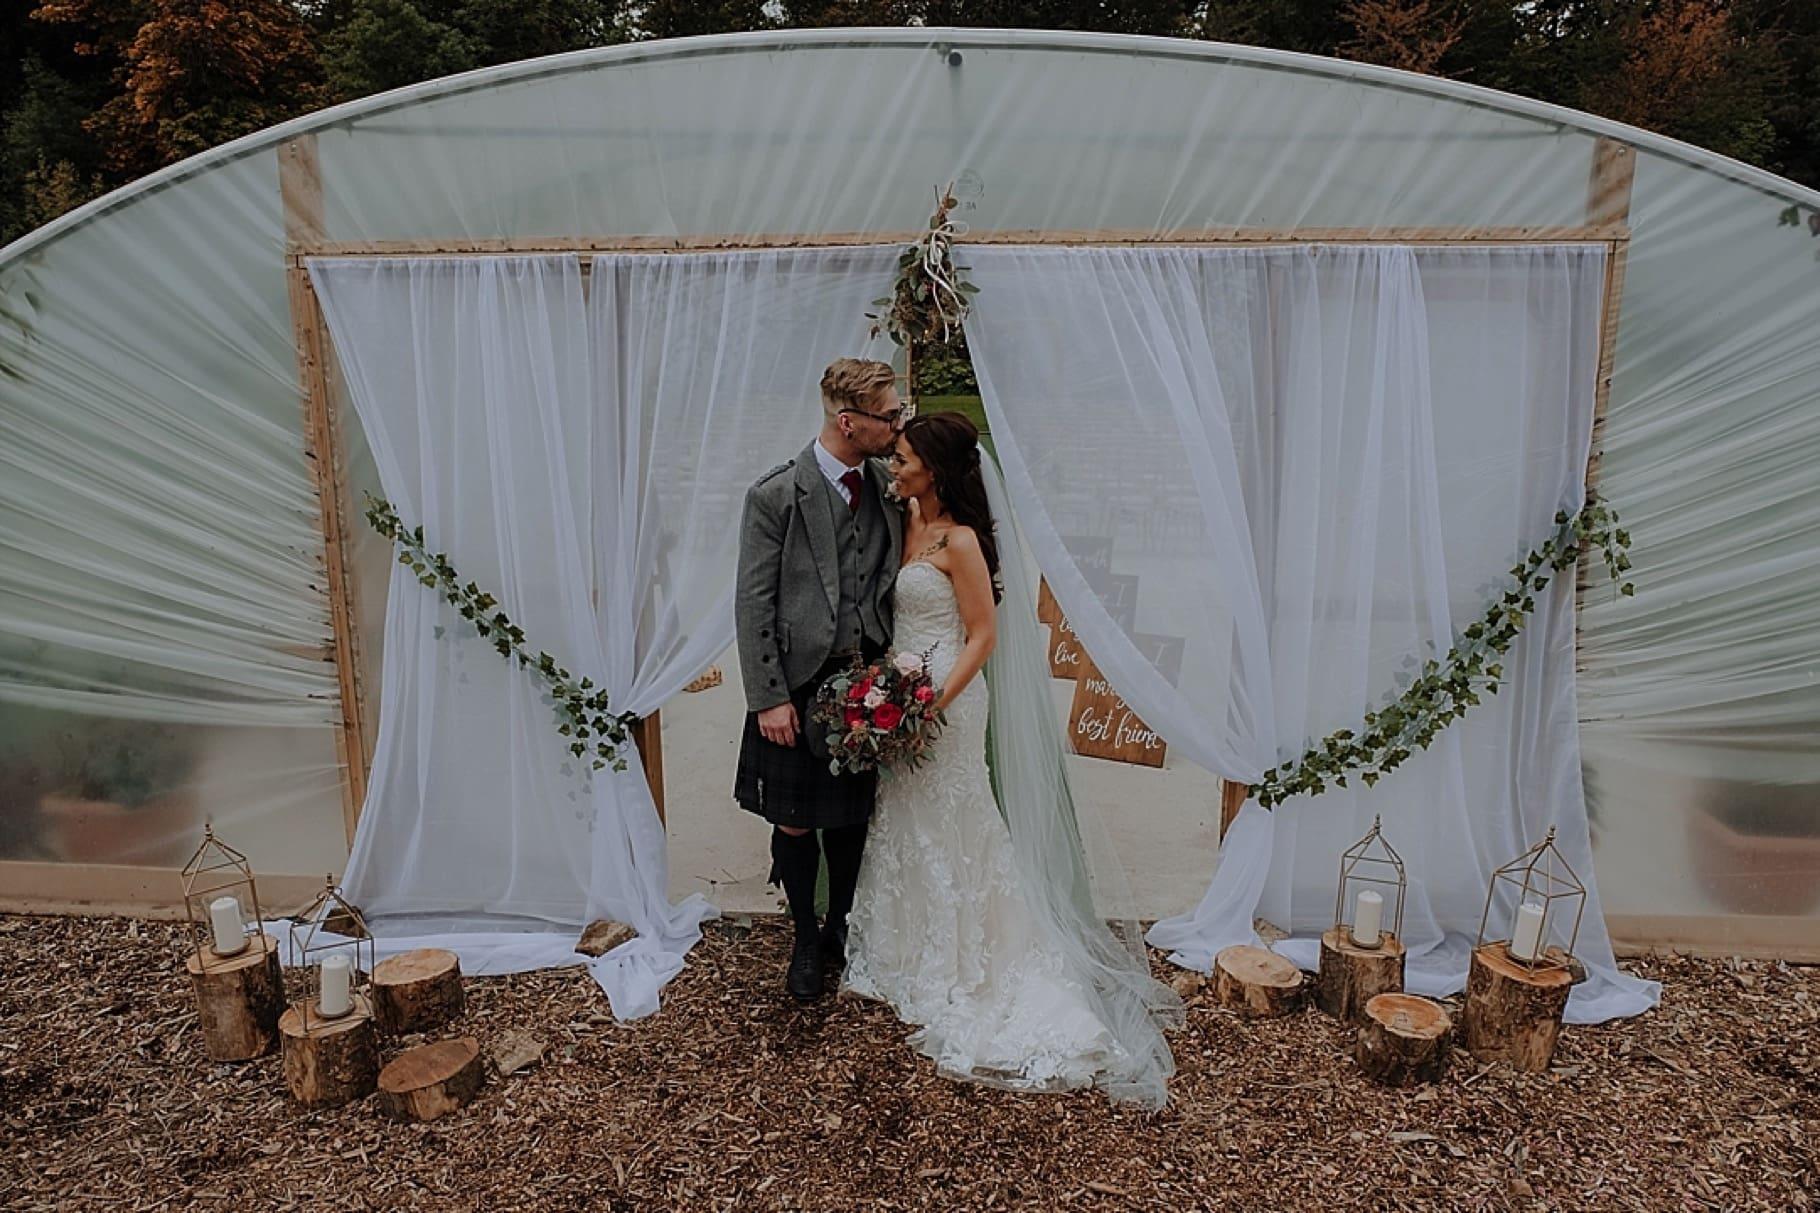 Colstoun House Polytunnel wedding